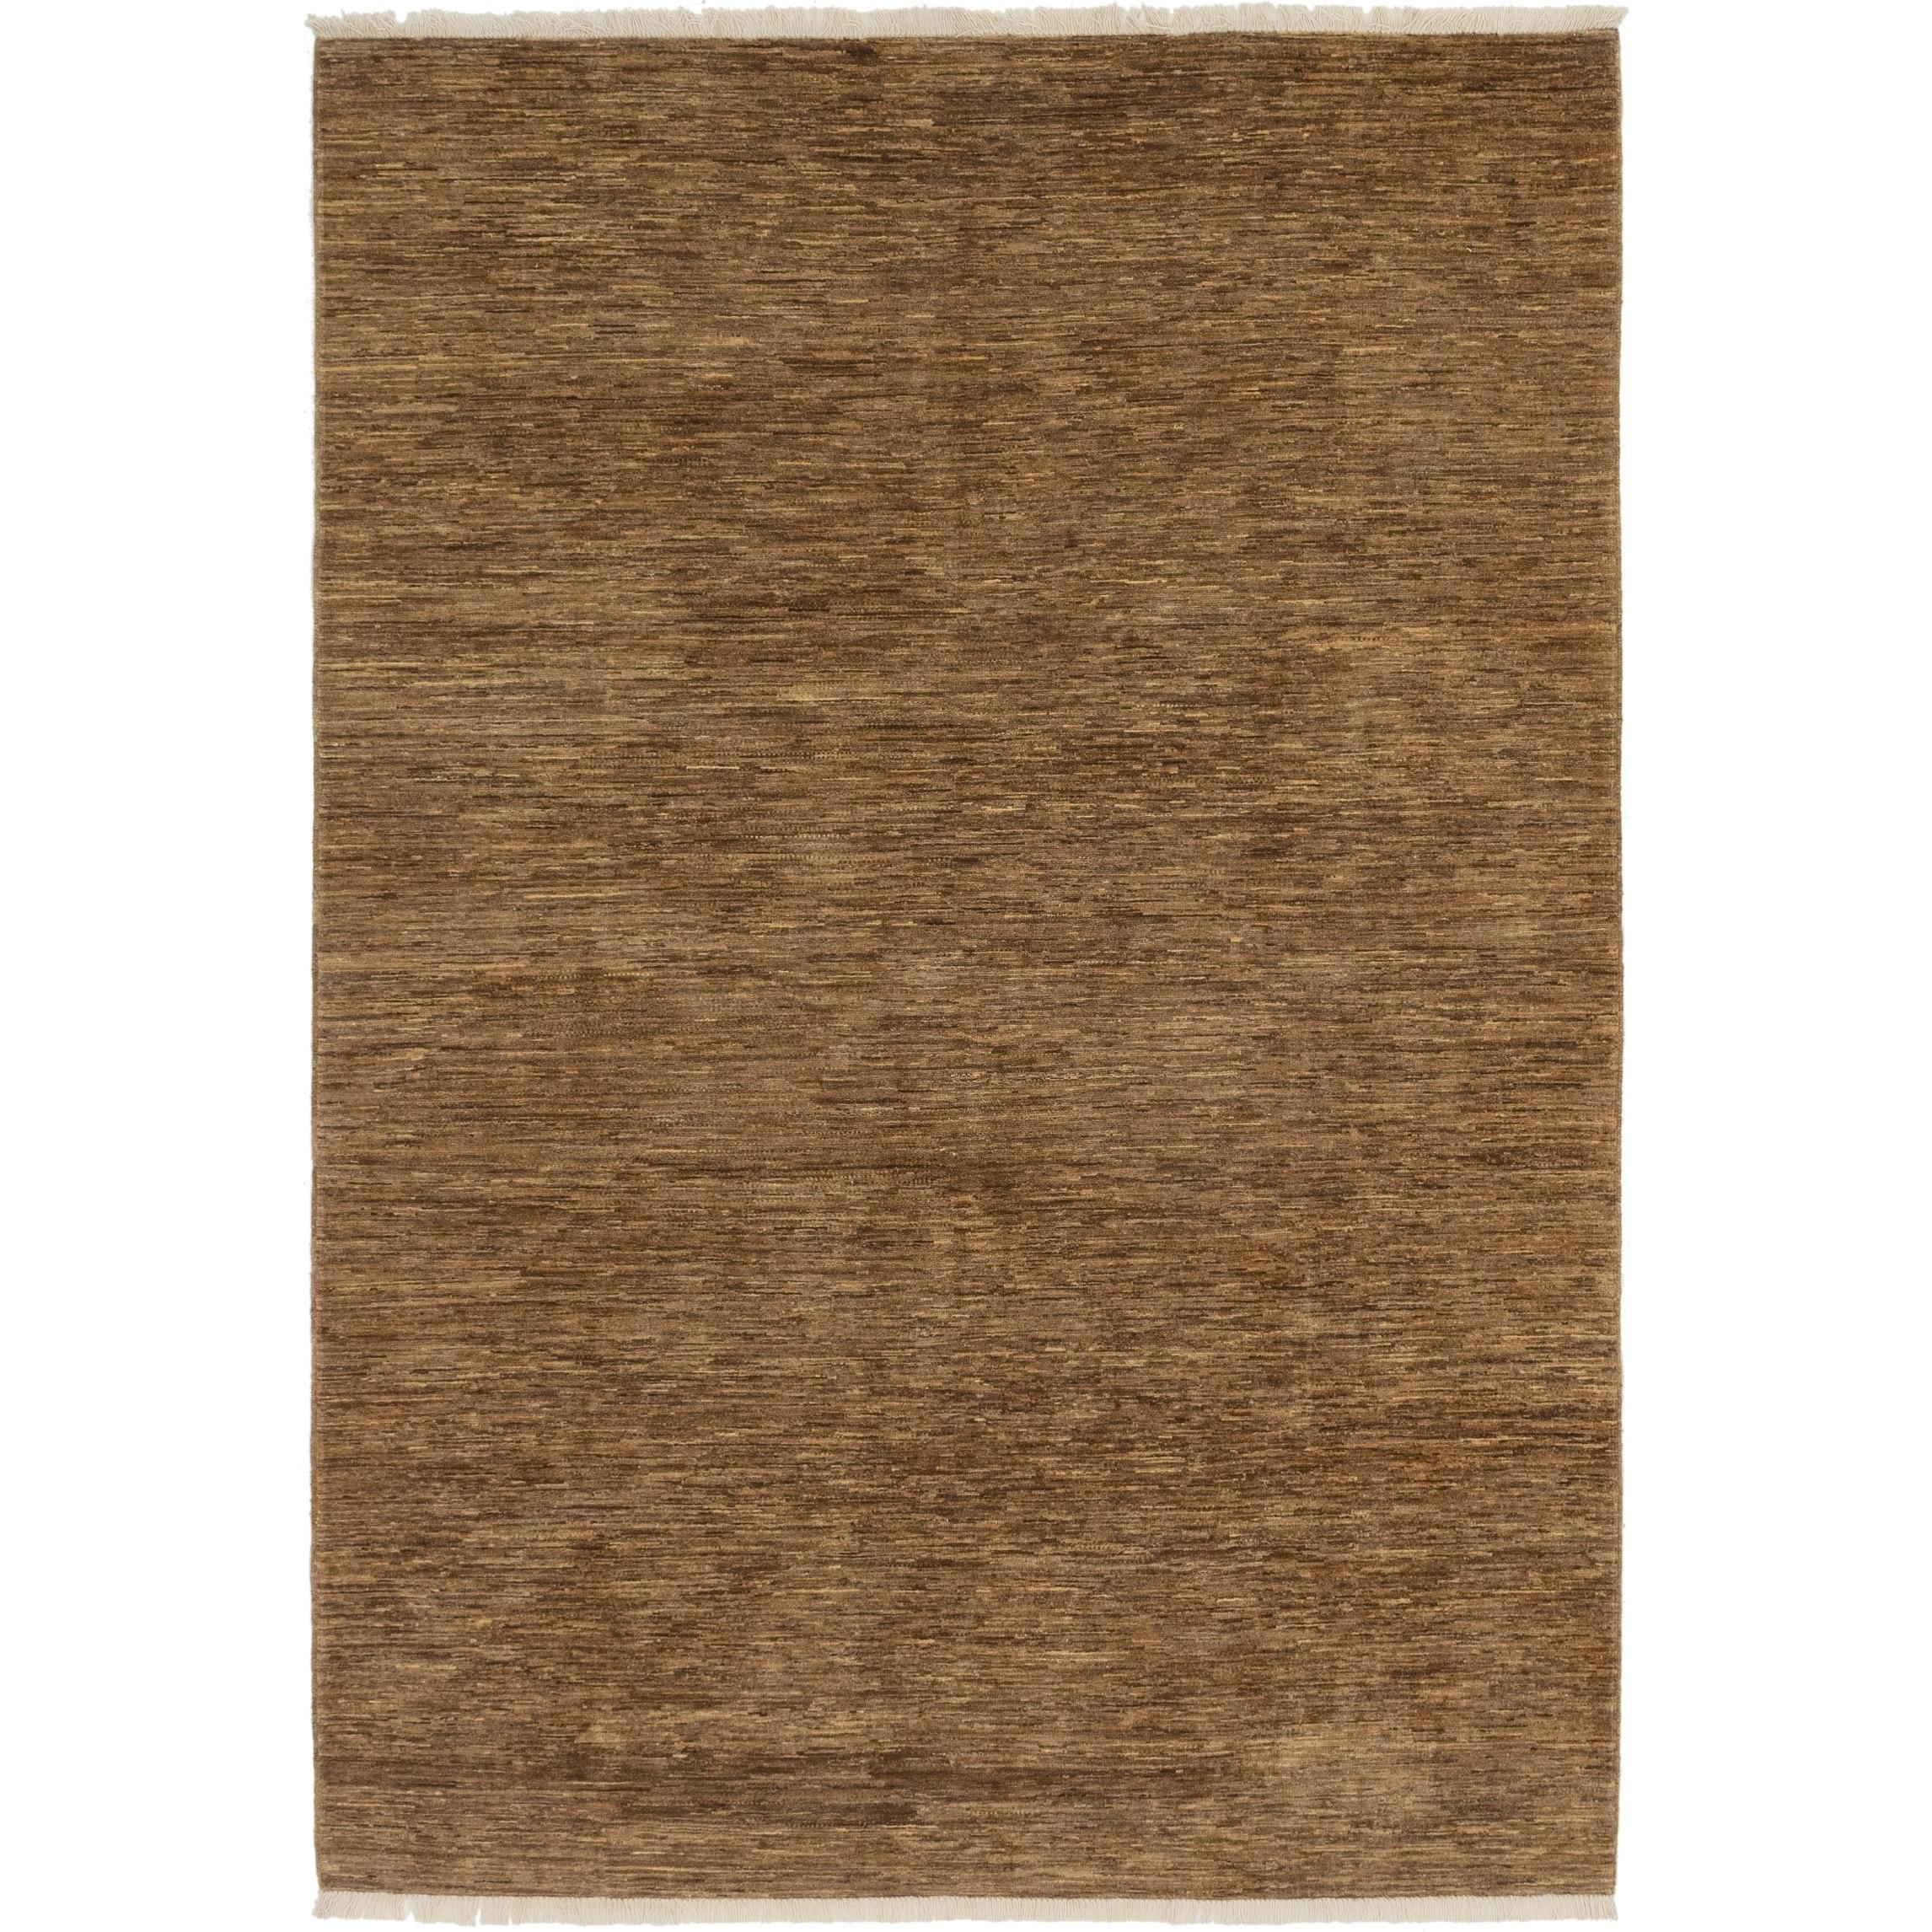 Hand Knotted Kashkuli Gabbeh Wool Area Rug - 6 8 x 9 8 (Light brown - 6 8 x 9 8)